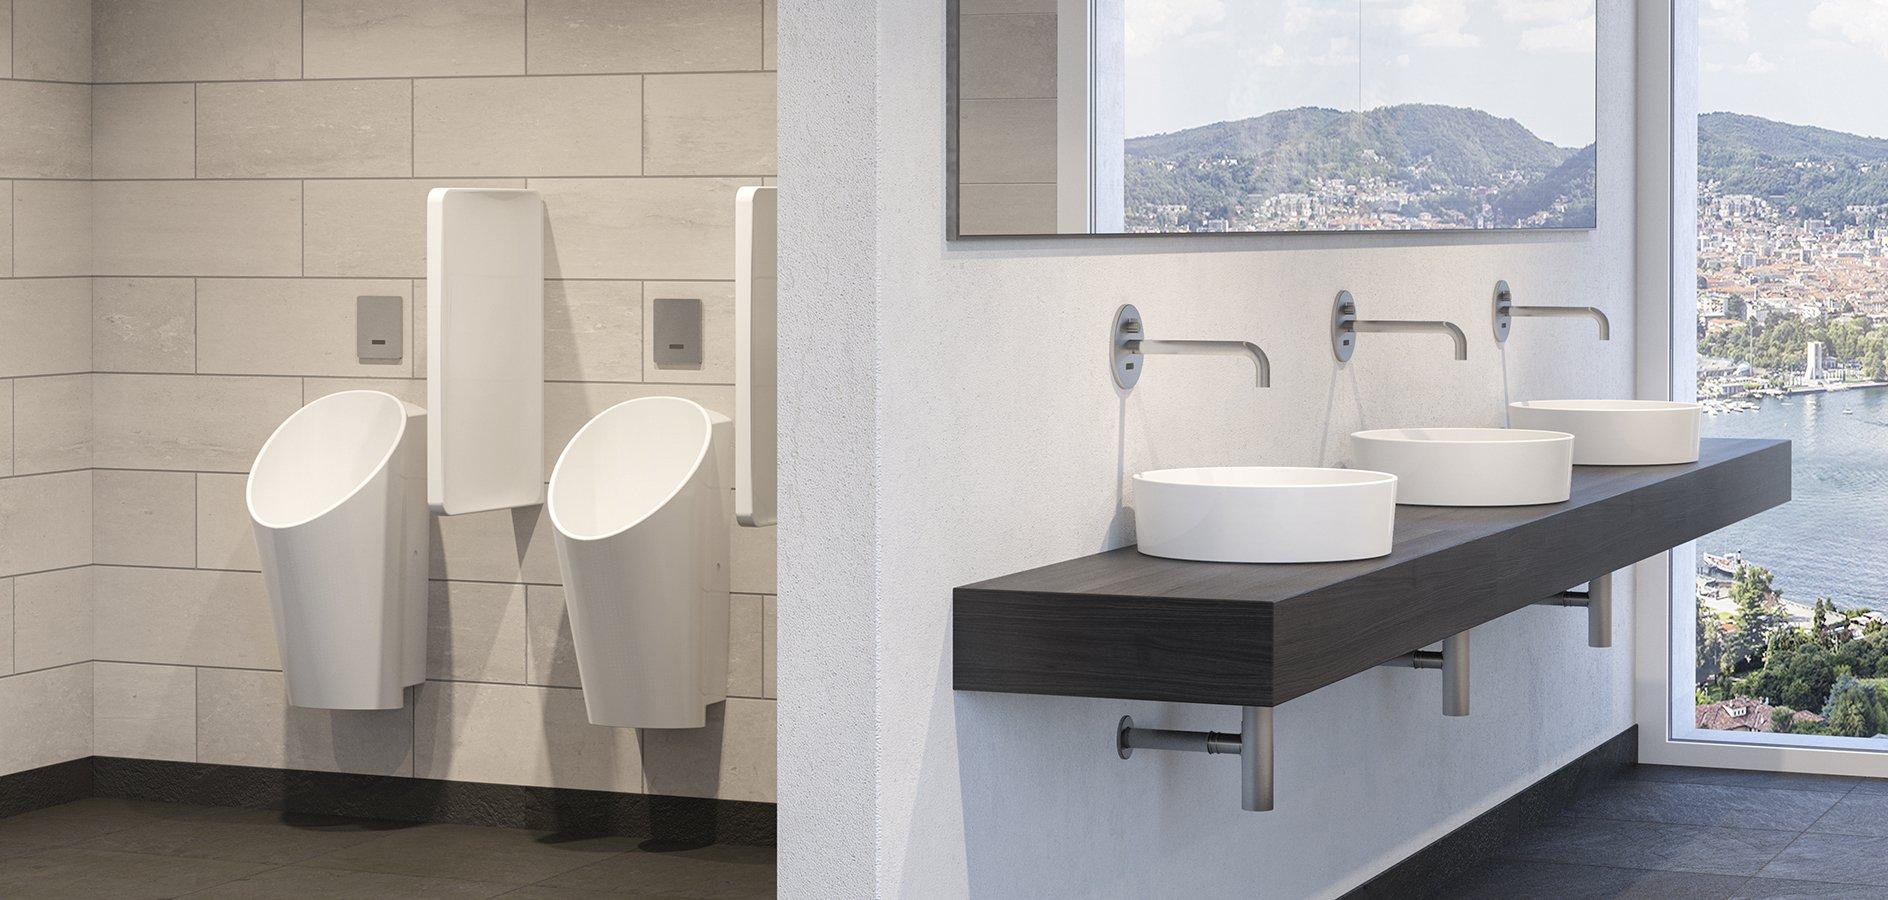 Urinale, Design, spülrandlos